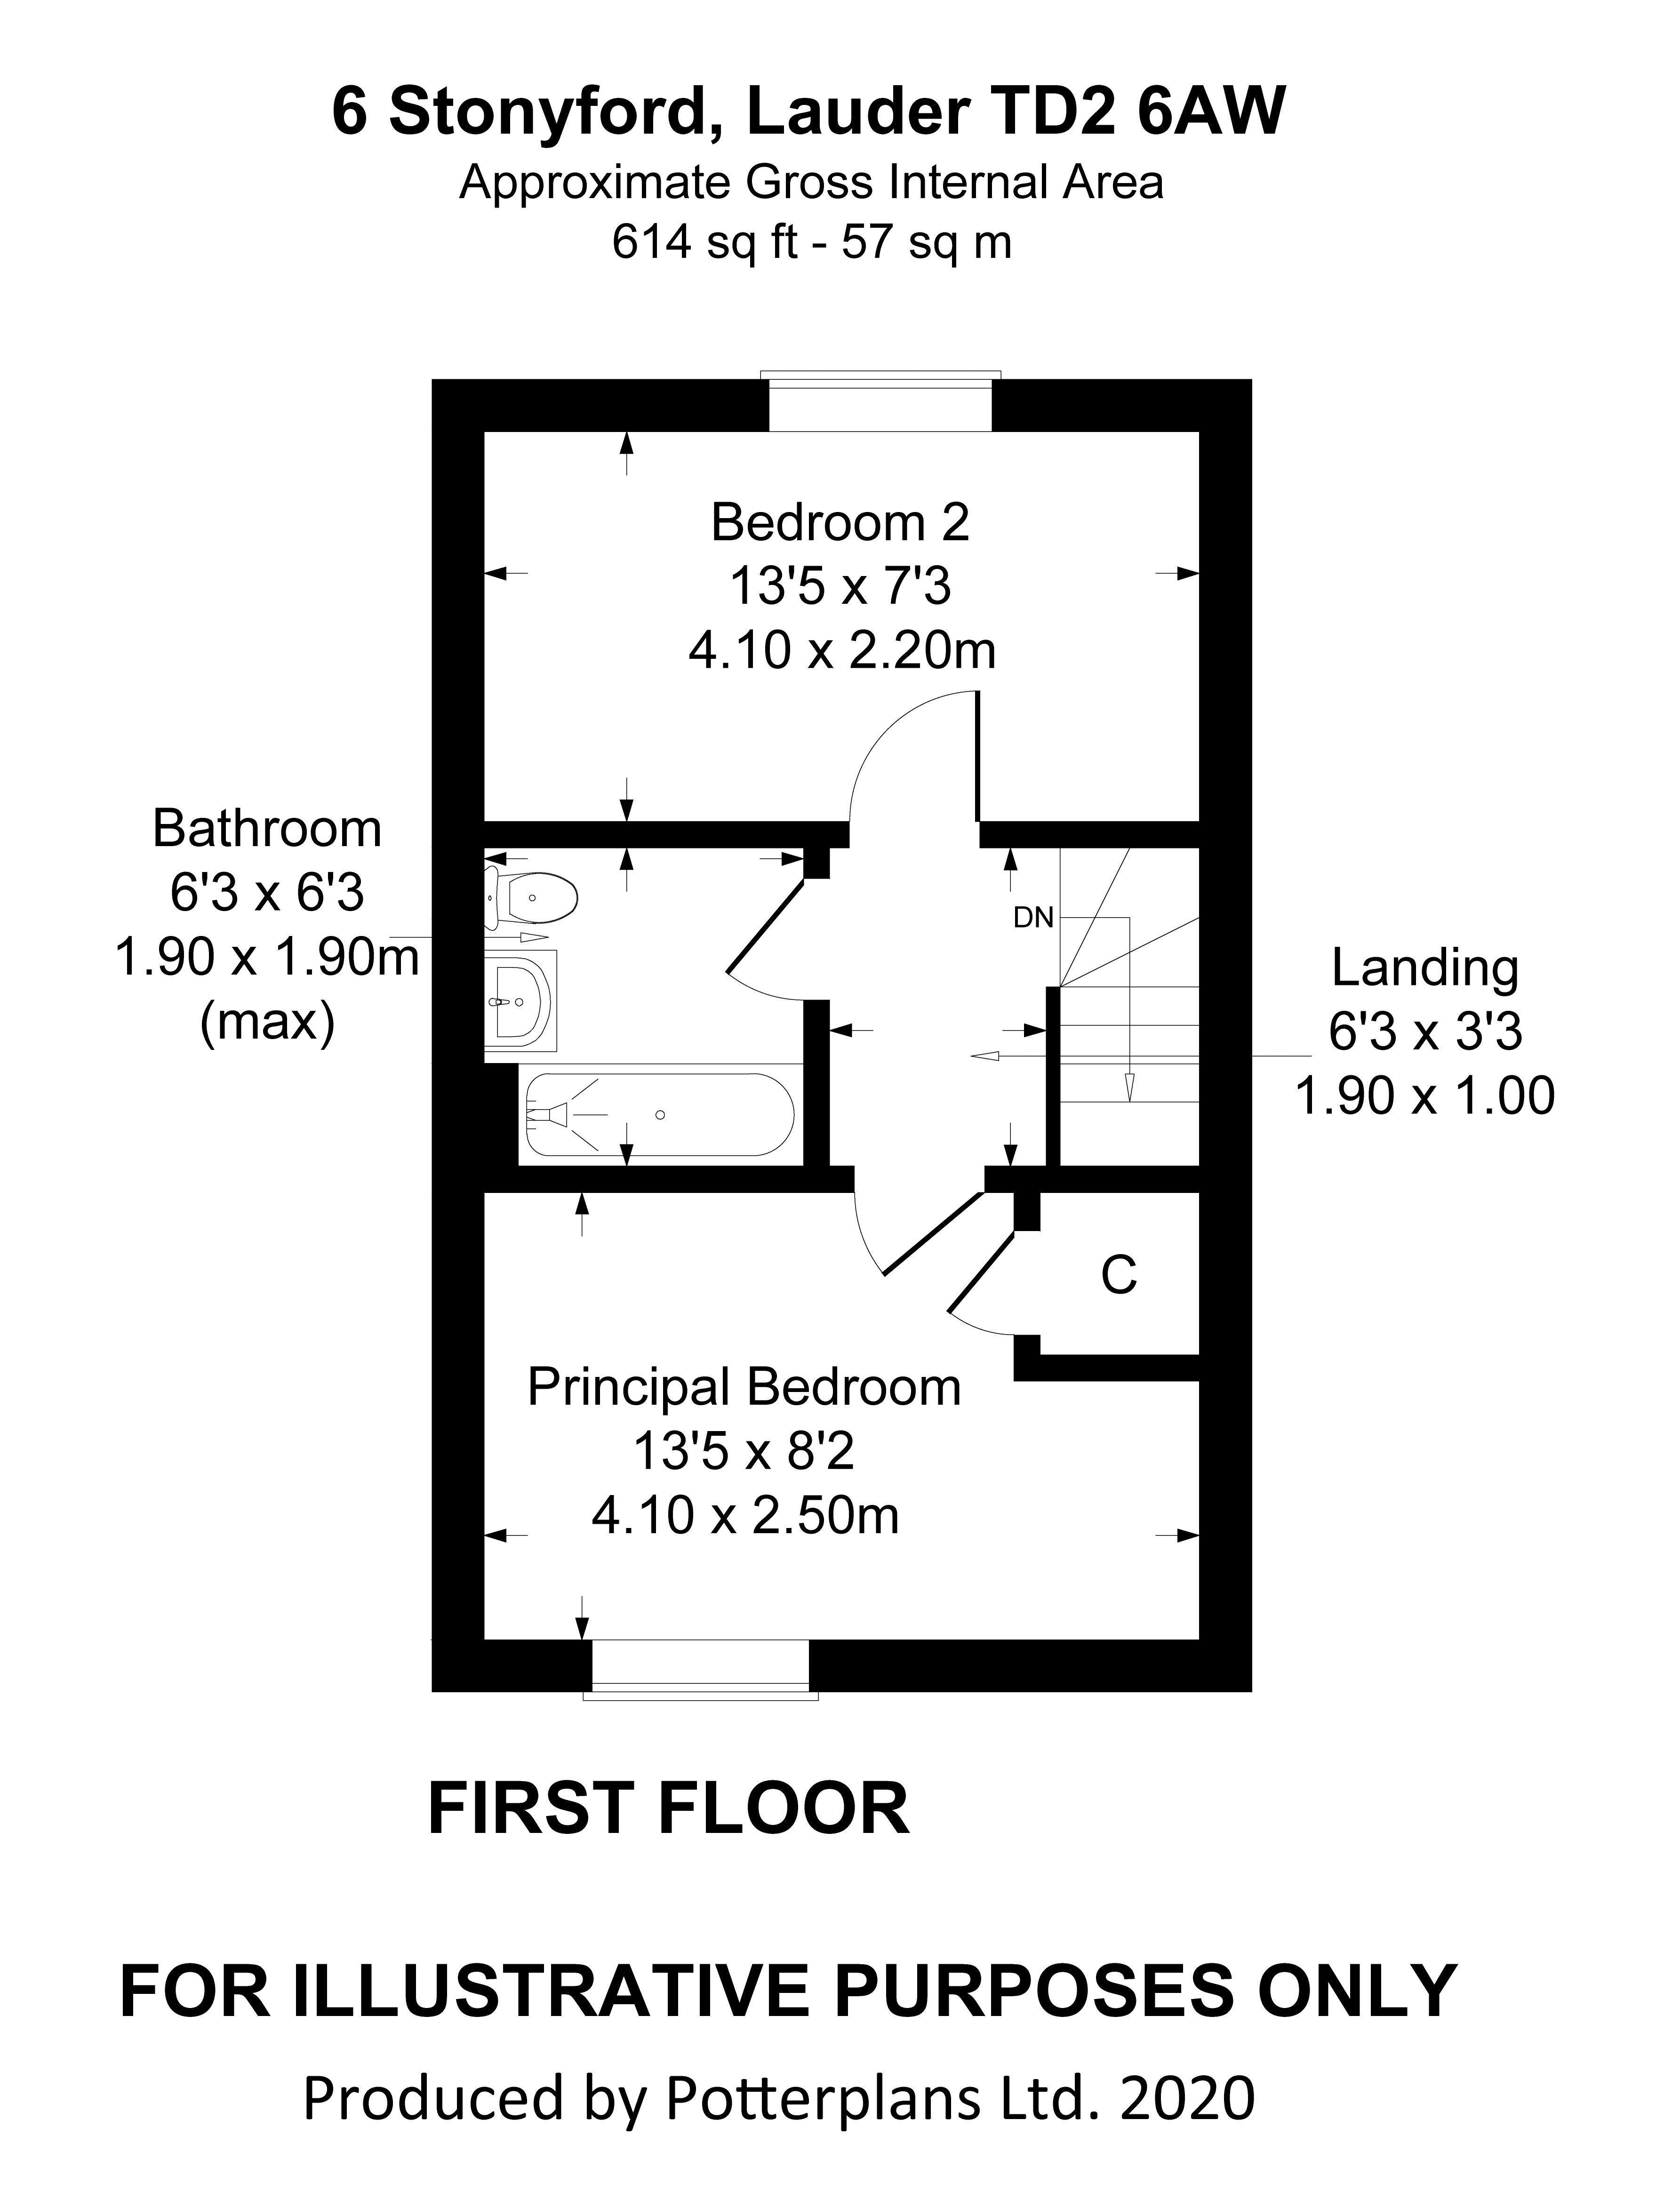 6 Stonyford First Floor